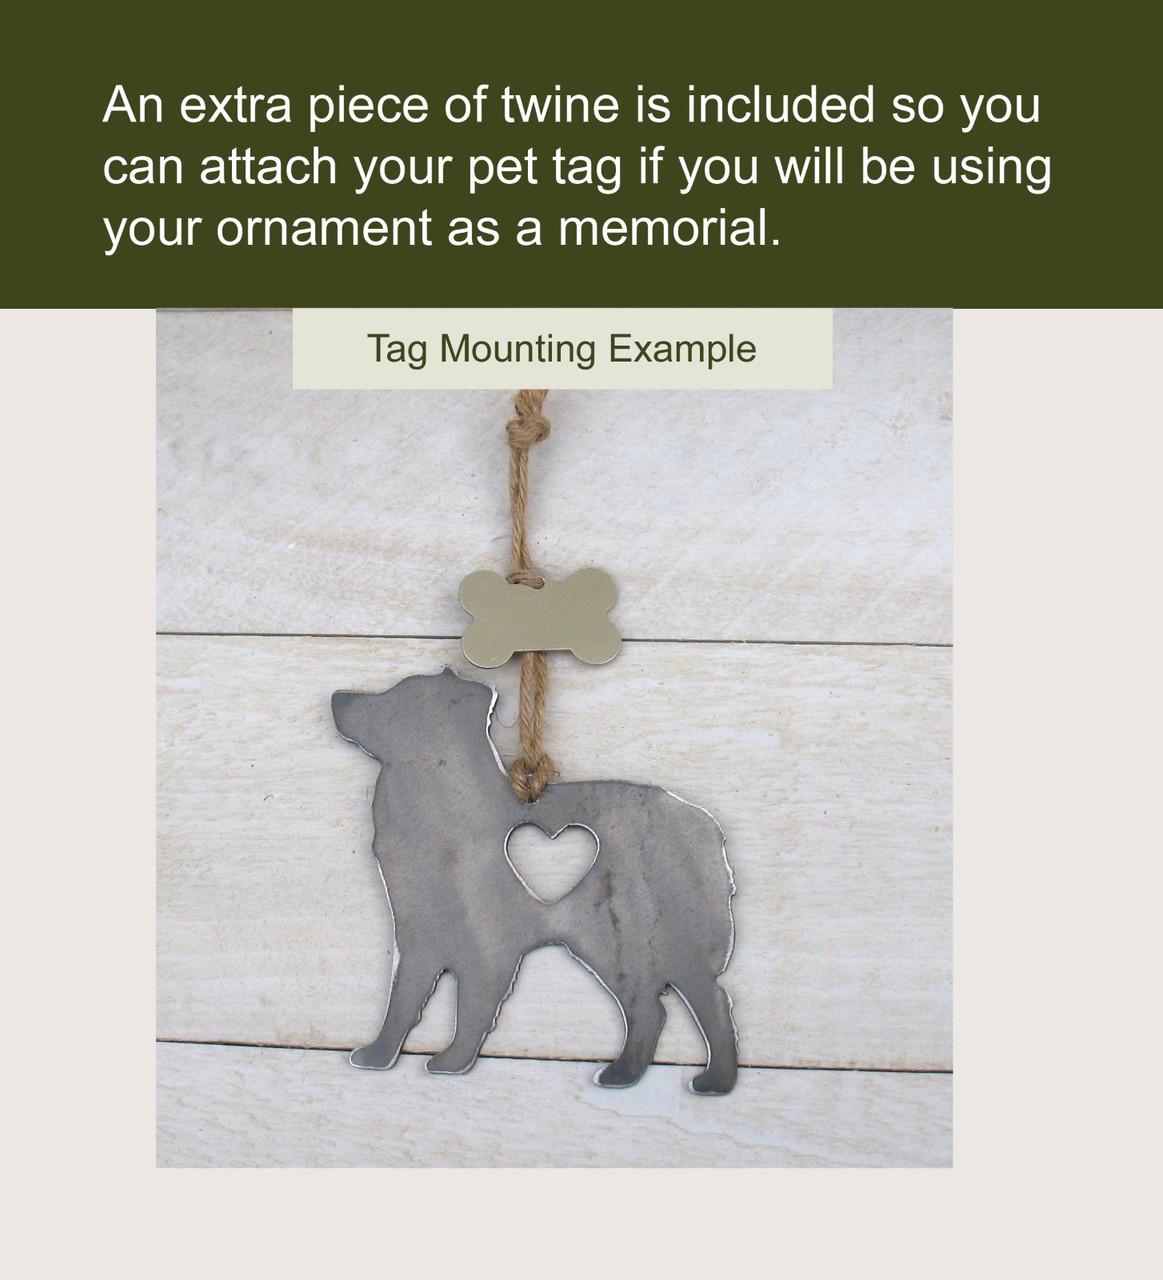 Shih Tzu Dog Ornament 1 - Metal Dog Easter Basket Gift for Her Him - Pet Lover Memorial Ornament - Pet Loss Dog Memorial Remembrance Gift